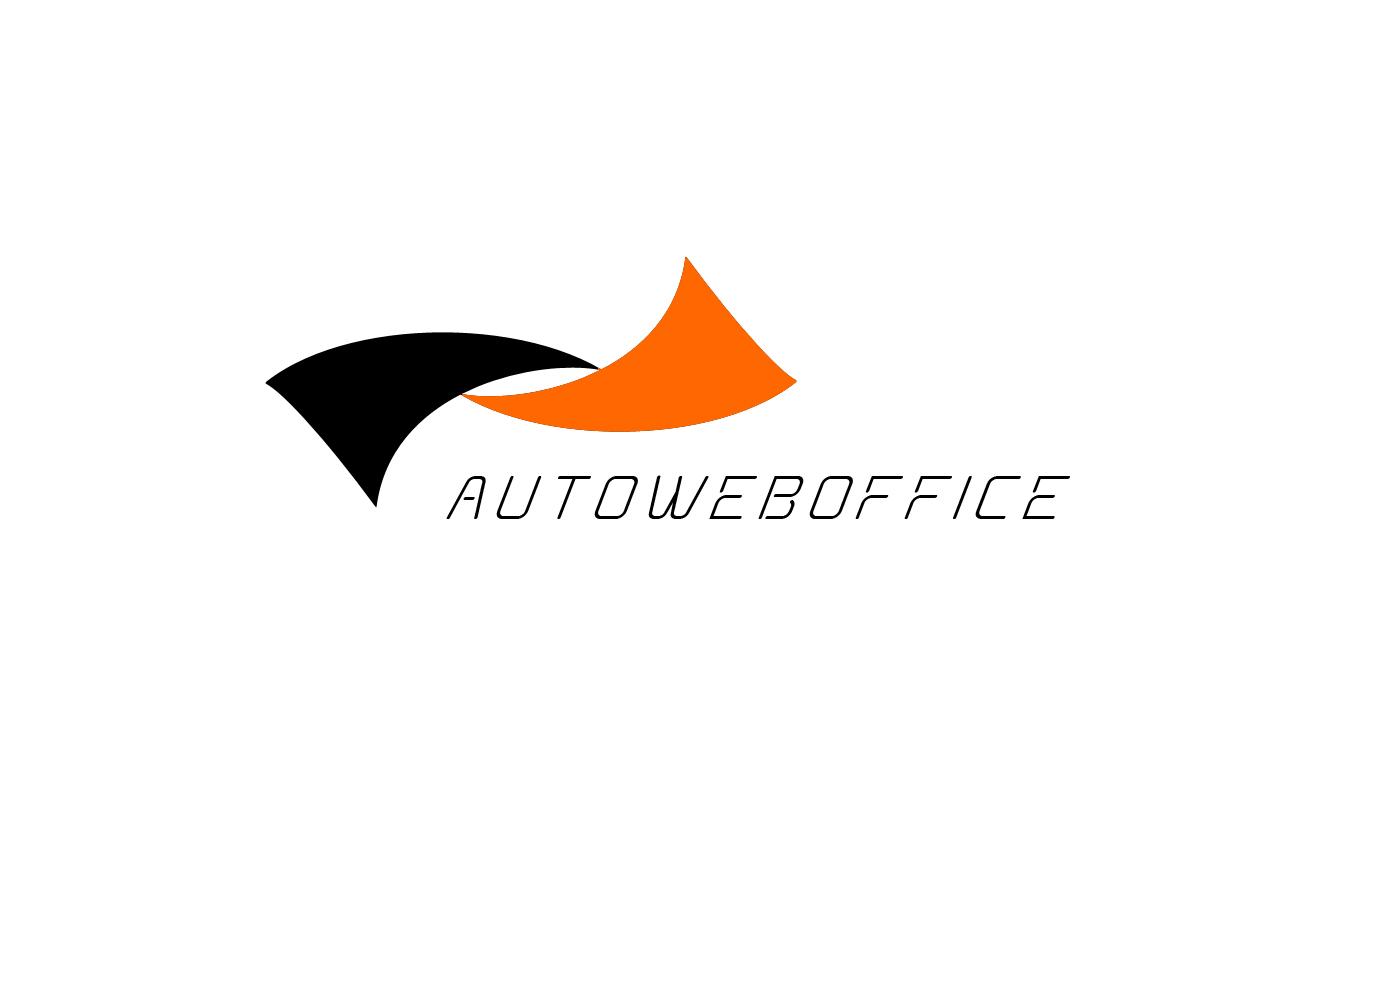 нужно разработать логотип компании фото f_50655798a4bd6f73.jpg